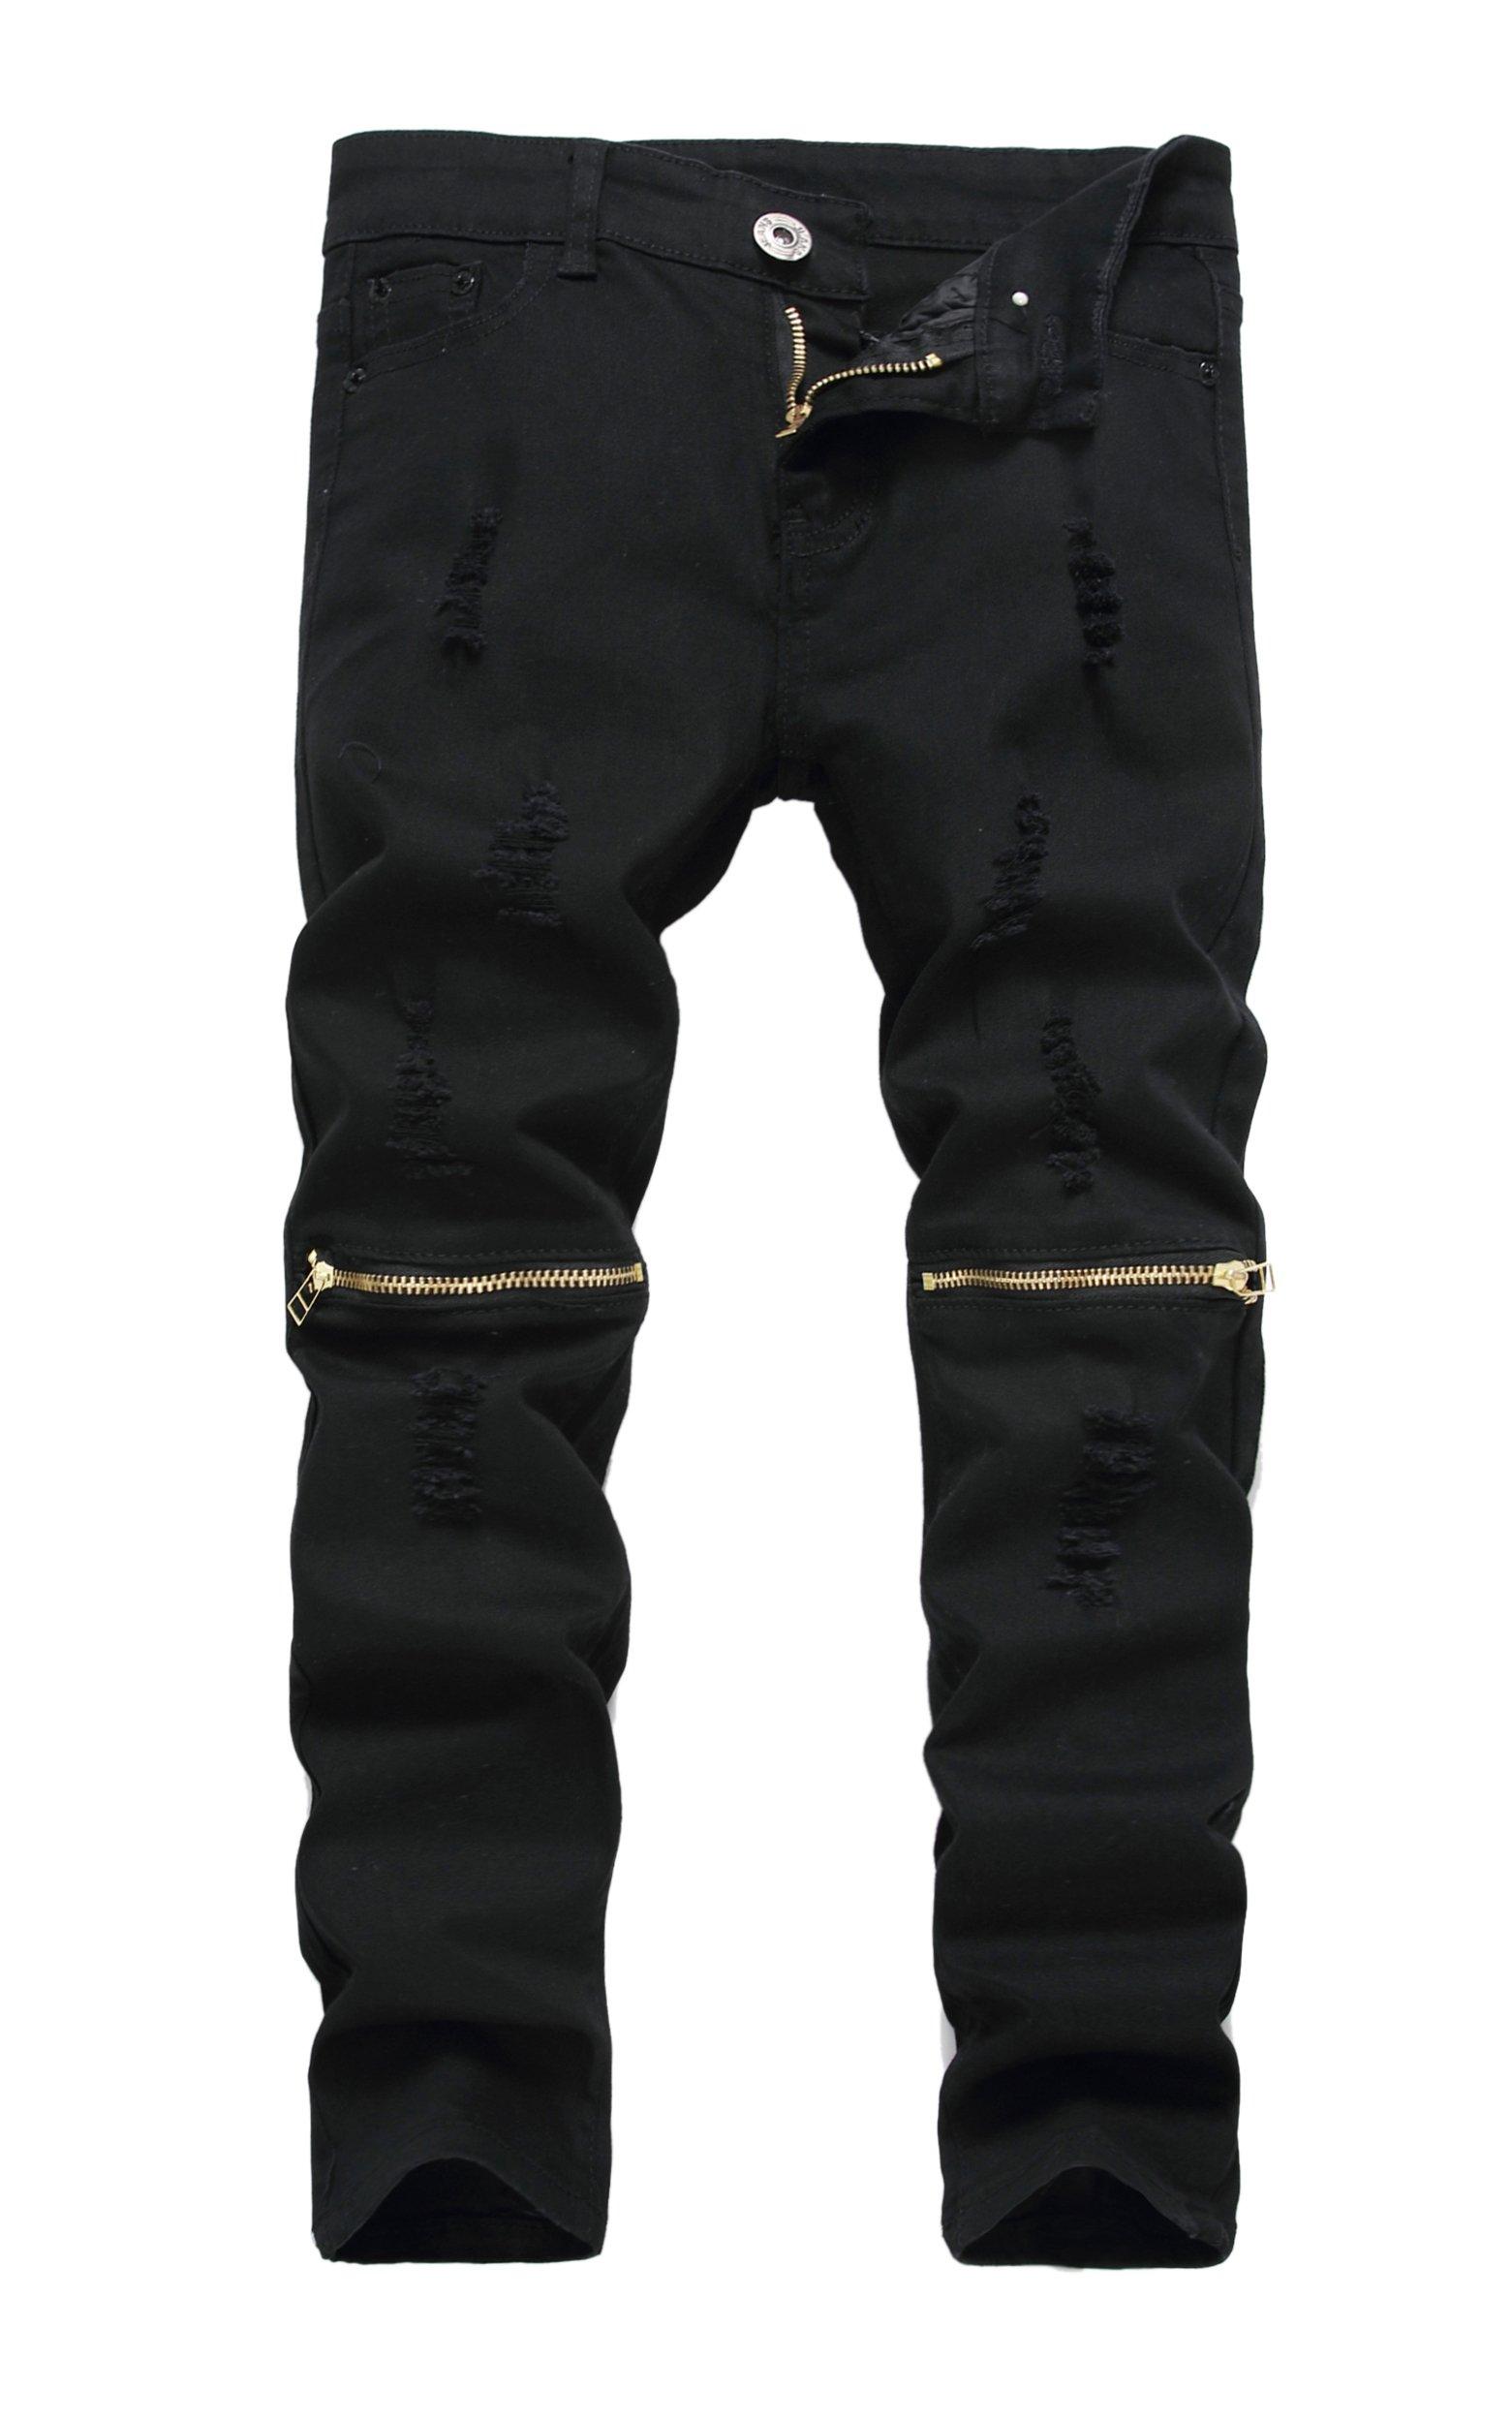 Boy's Black Slim Fit Skinny Jeans Ripped Elastic Waist Pants with Zipper for Kids,Black,16 Slim